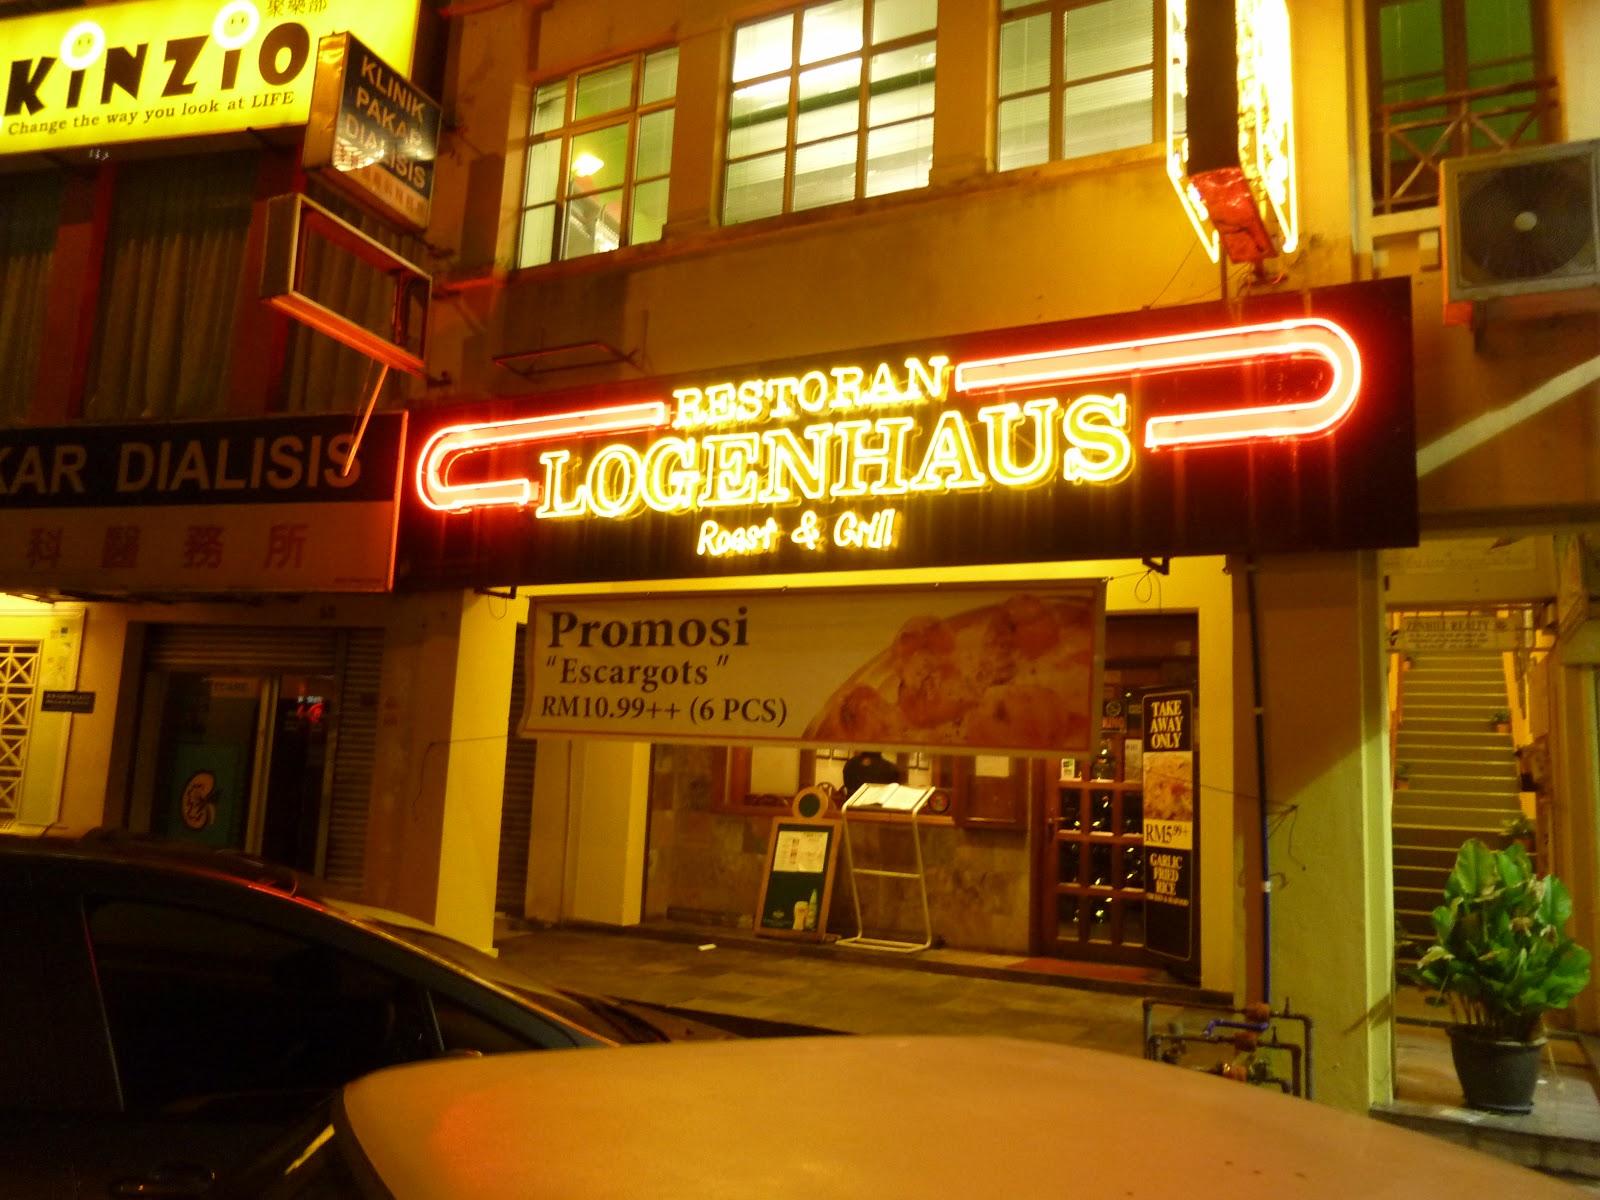 Logenhaus Roast & Grill>